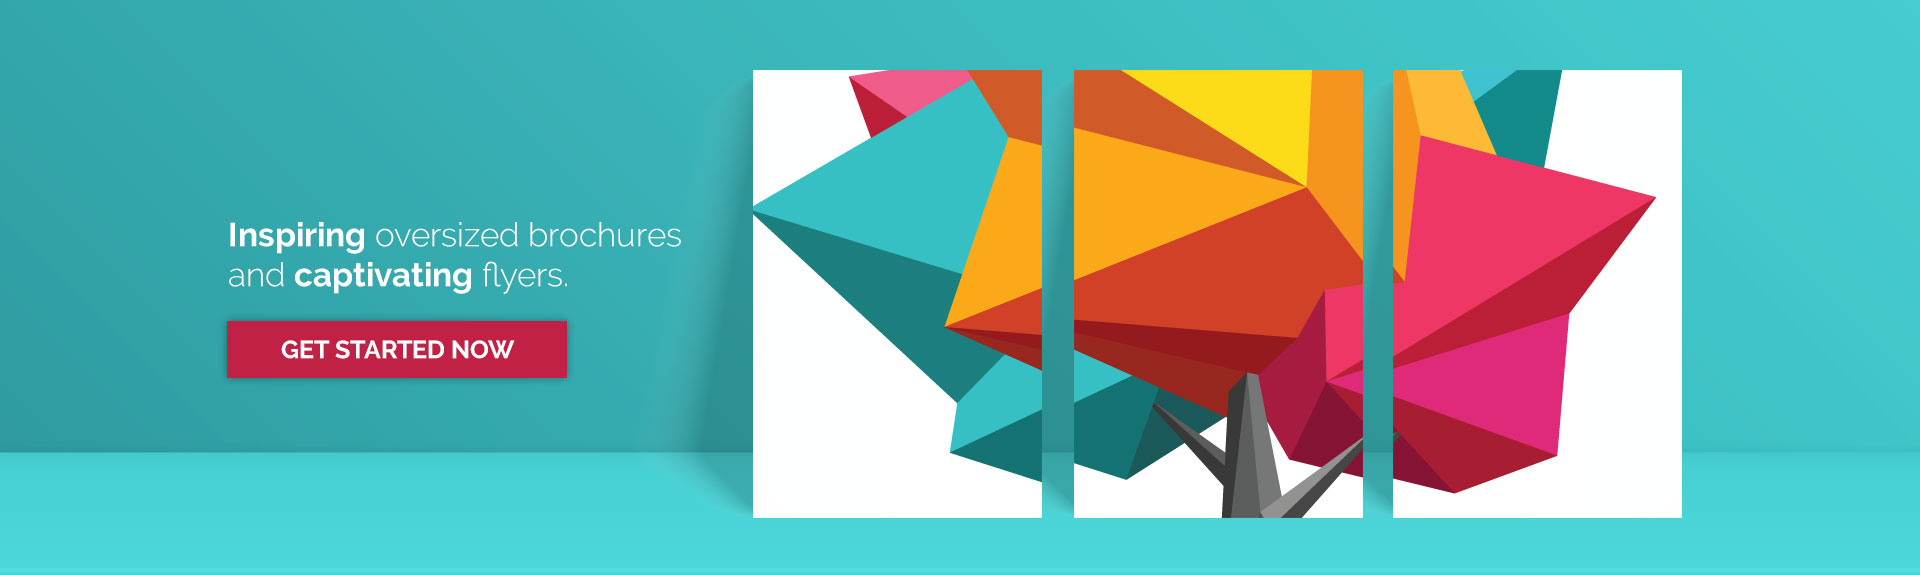 Inspiring Oversized Brochures & Captivating Flyers